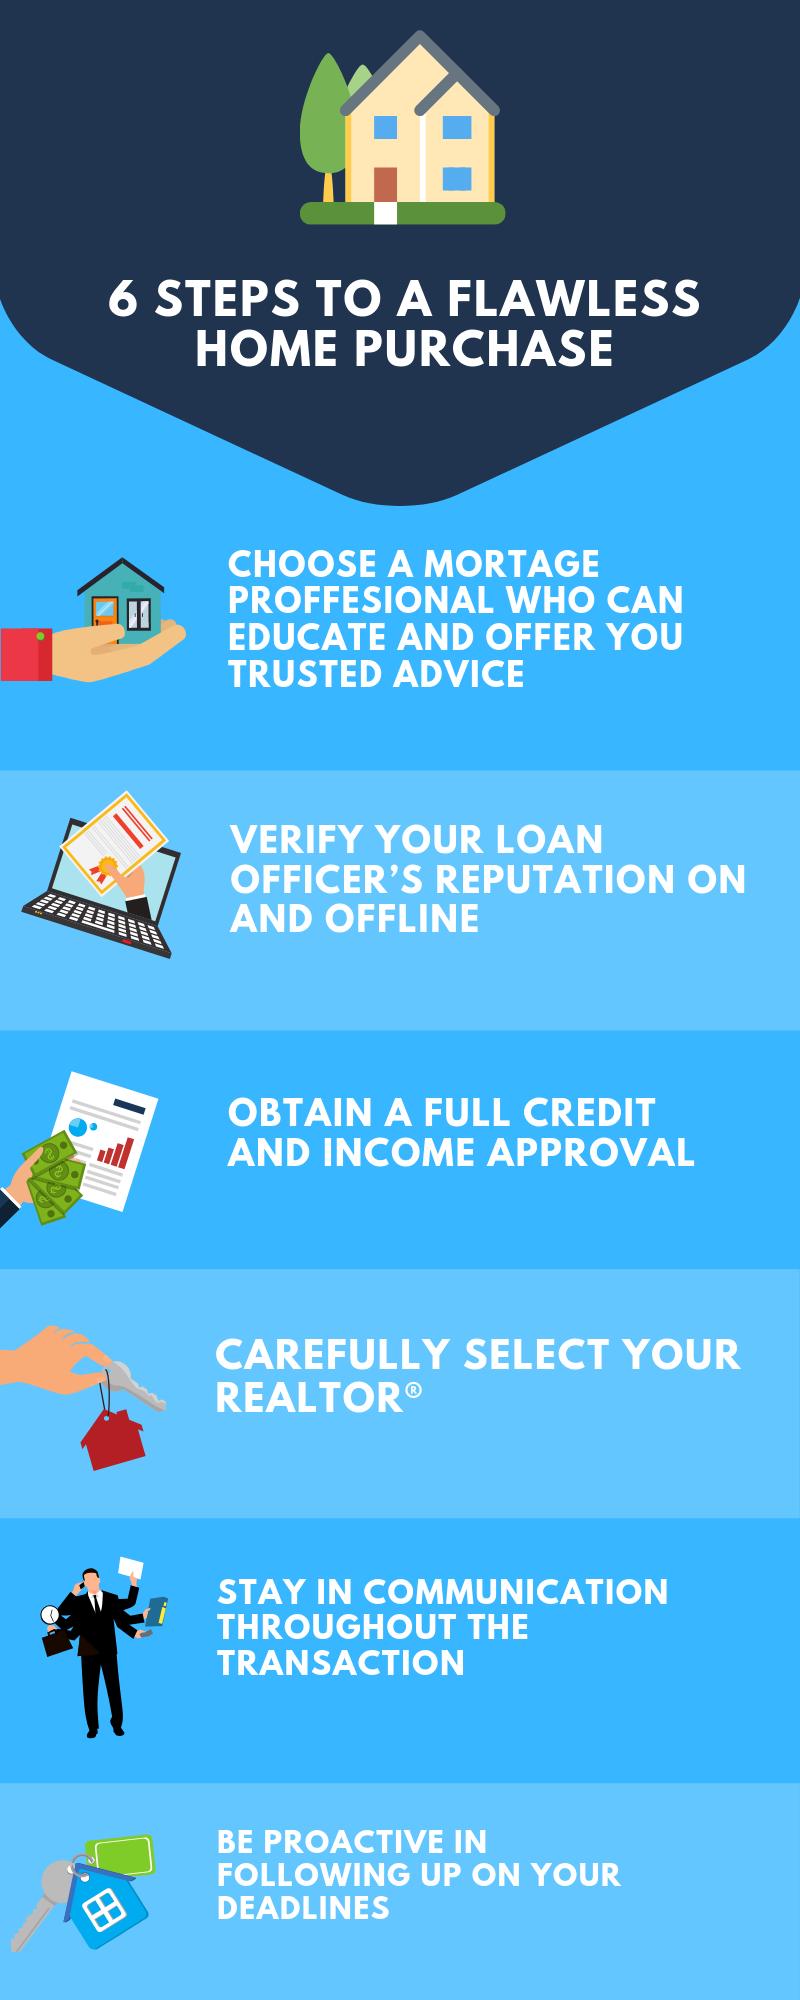 personal finance real estate realtor sell loan bank